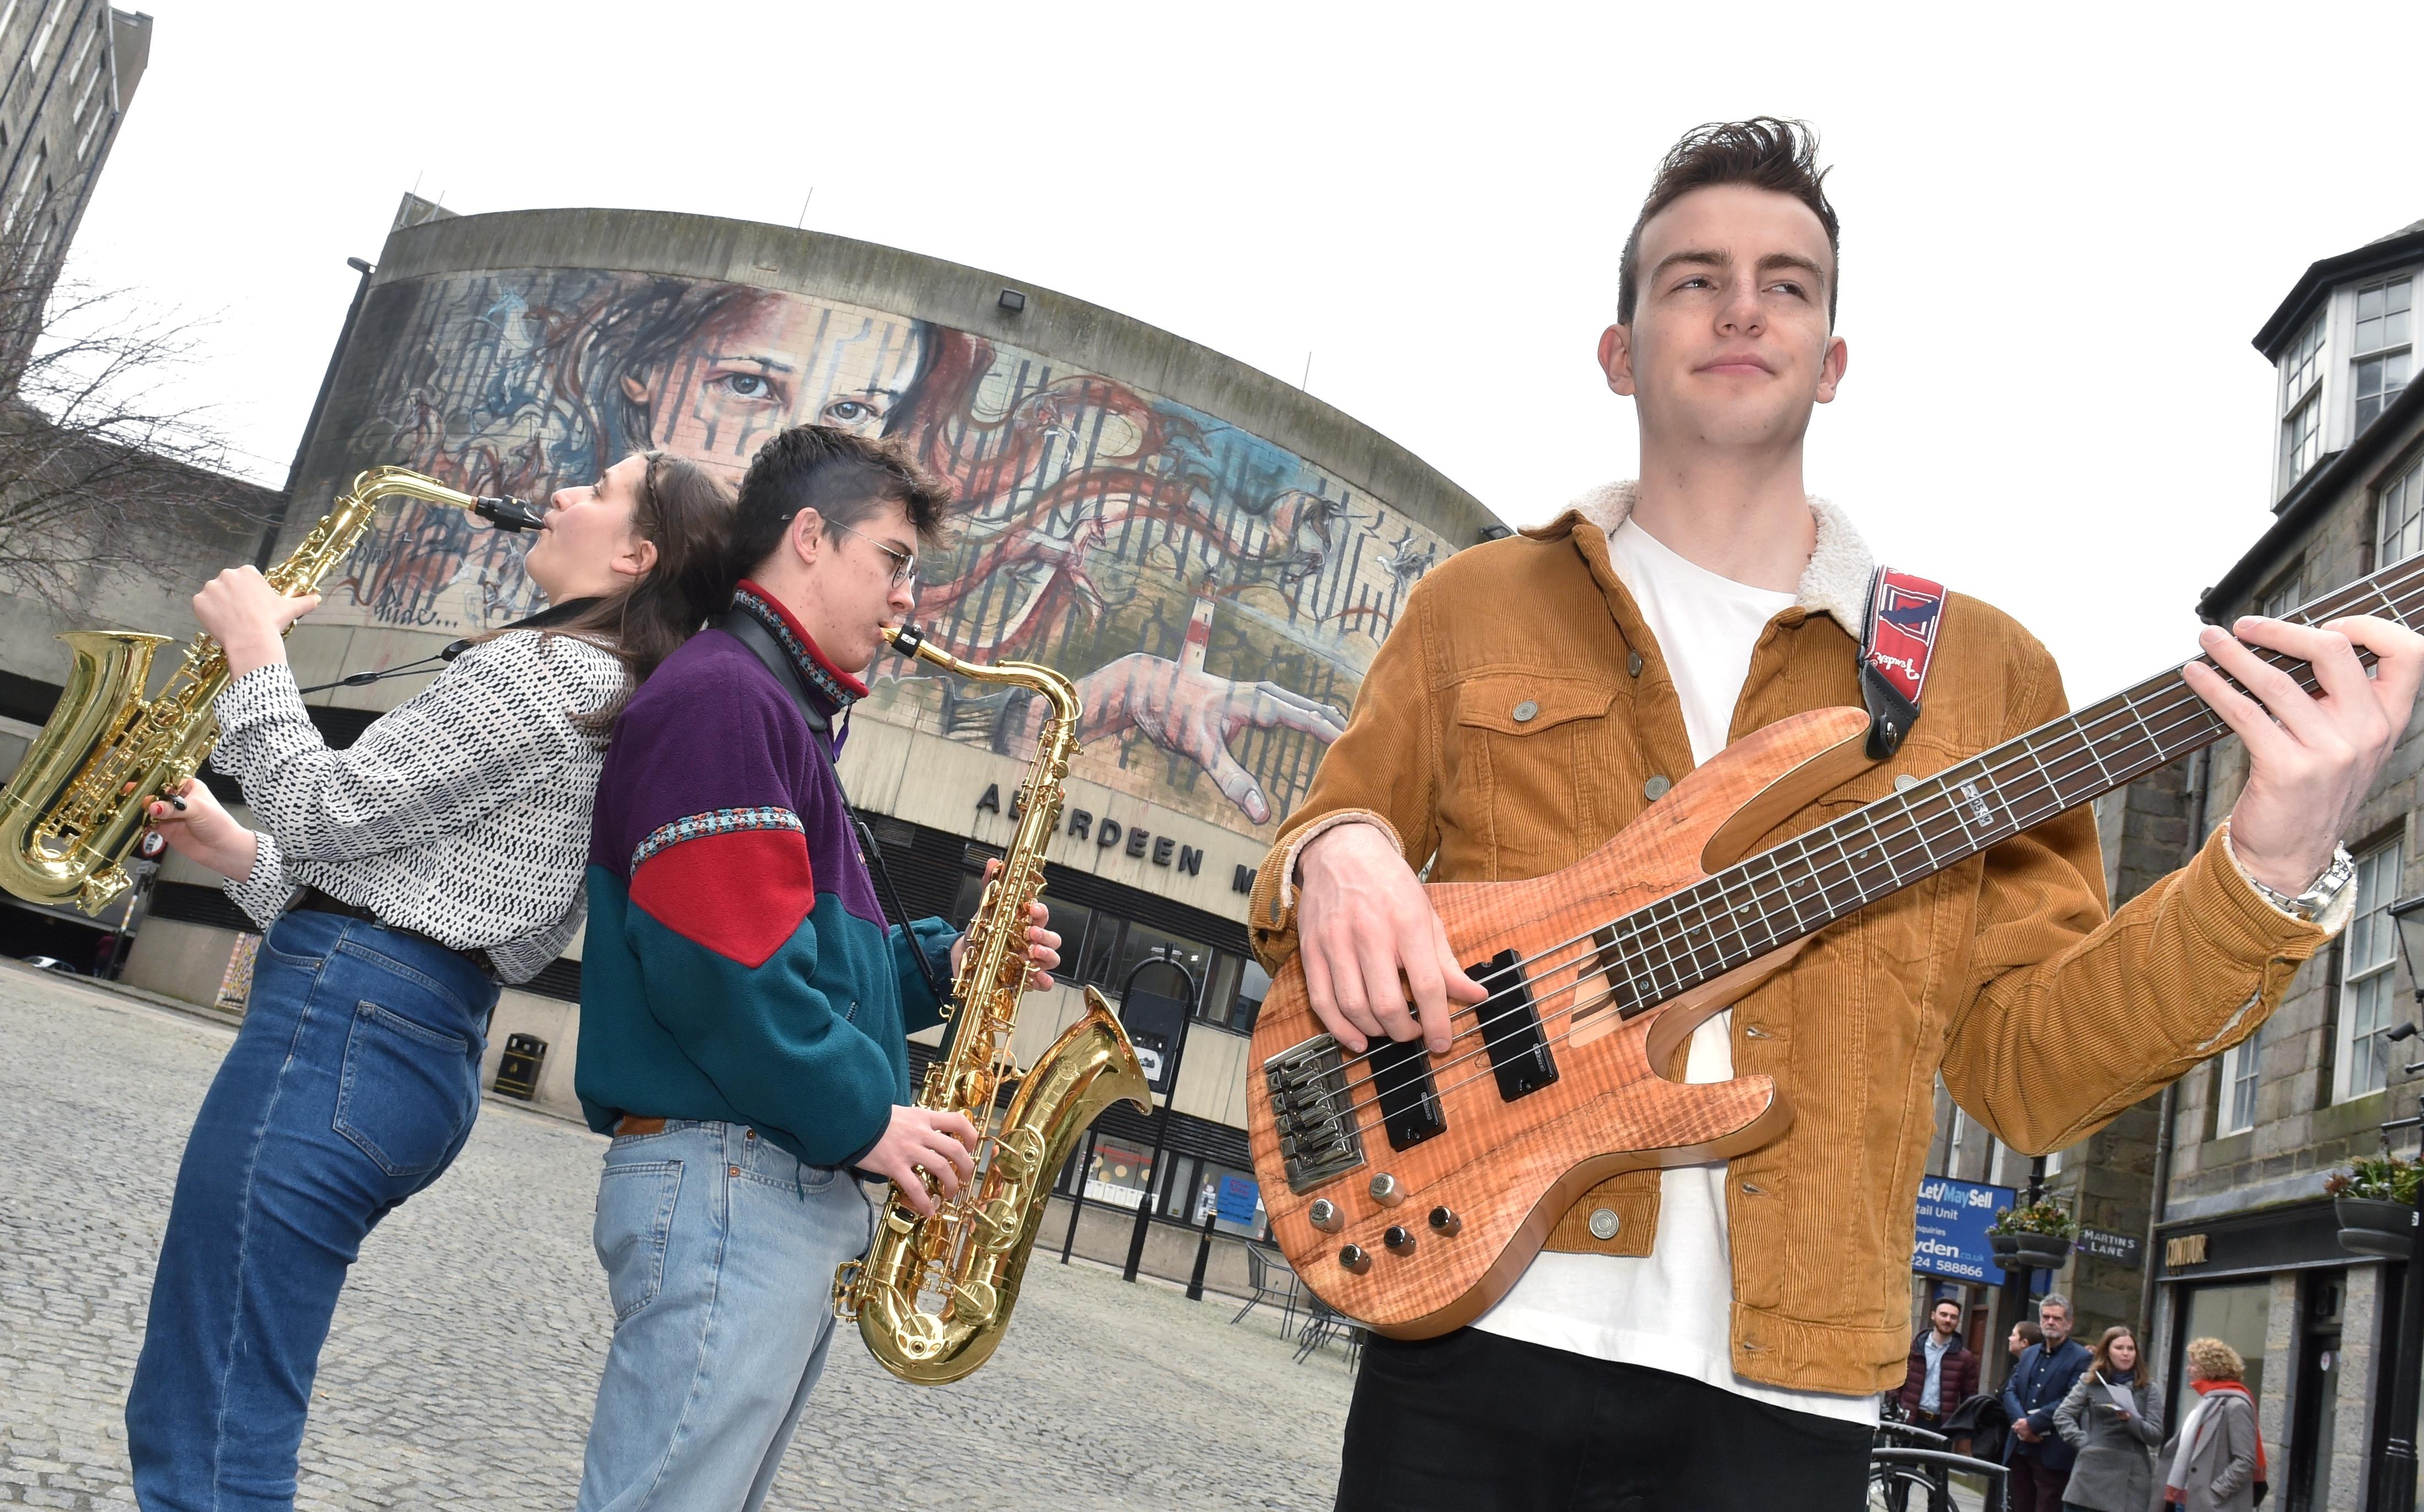 Jazz players Josie Fairley Keast, Matthew Kilner and Finley Campbell.